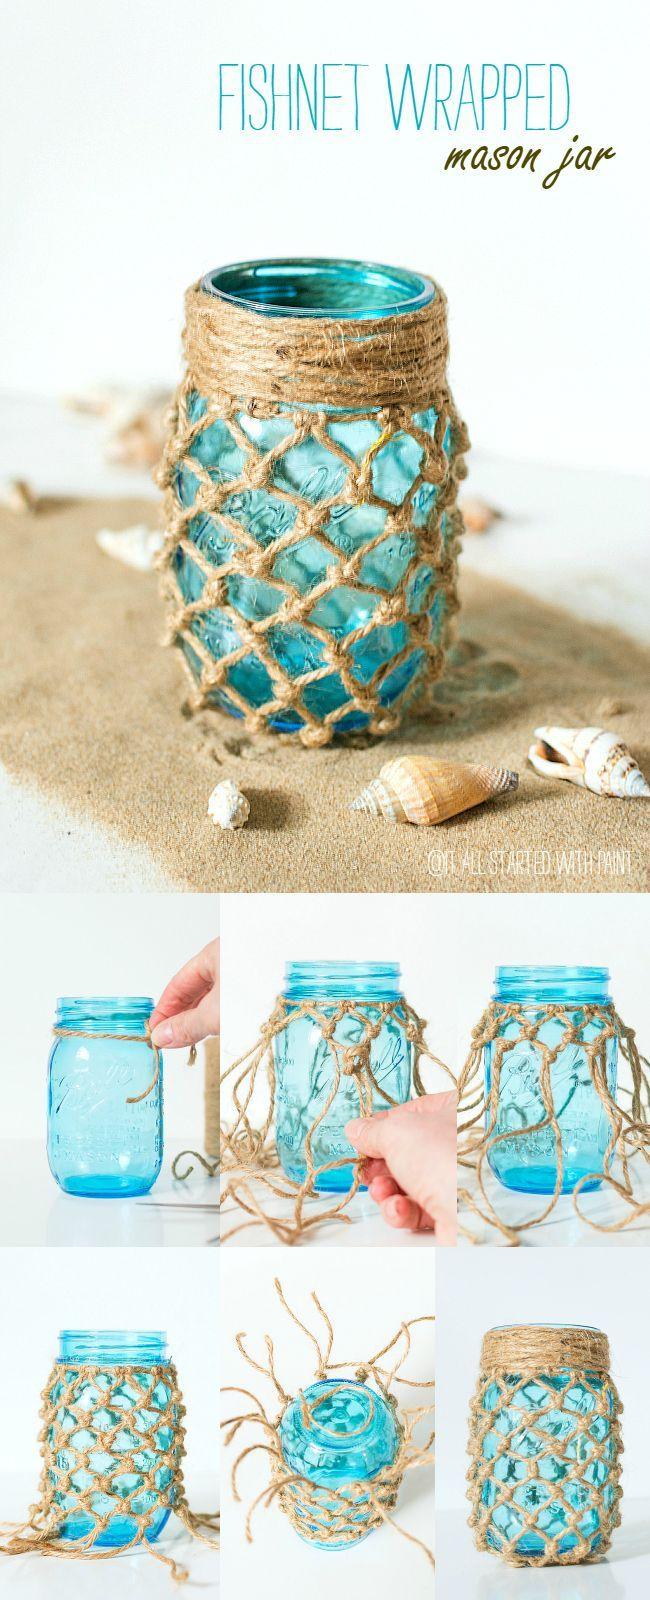 Fishnet Wrapped Mason Jar Craft is part of diy_crafts - Macrame project to create a coastal look fishnet wrapped mason jar  Using jute rope and vintagelook blue mason jar  Includes stepbystep diy instructions